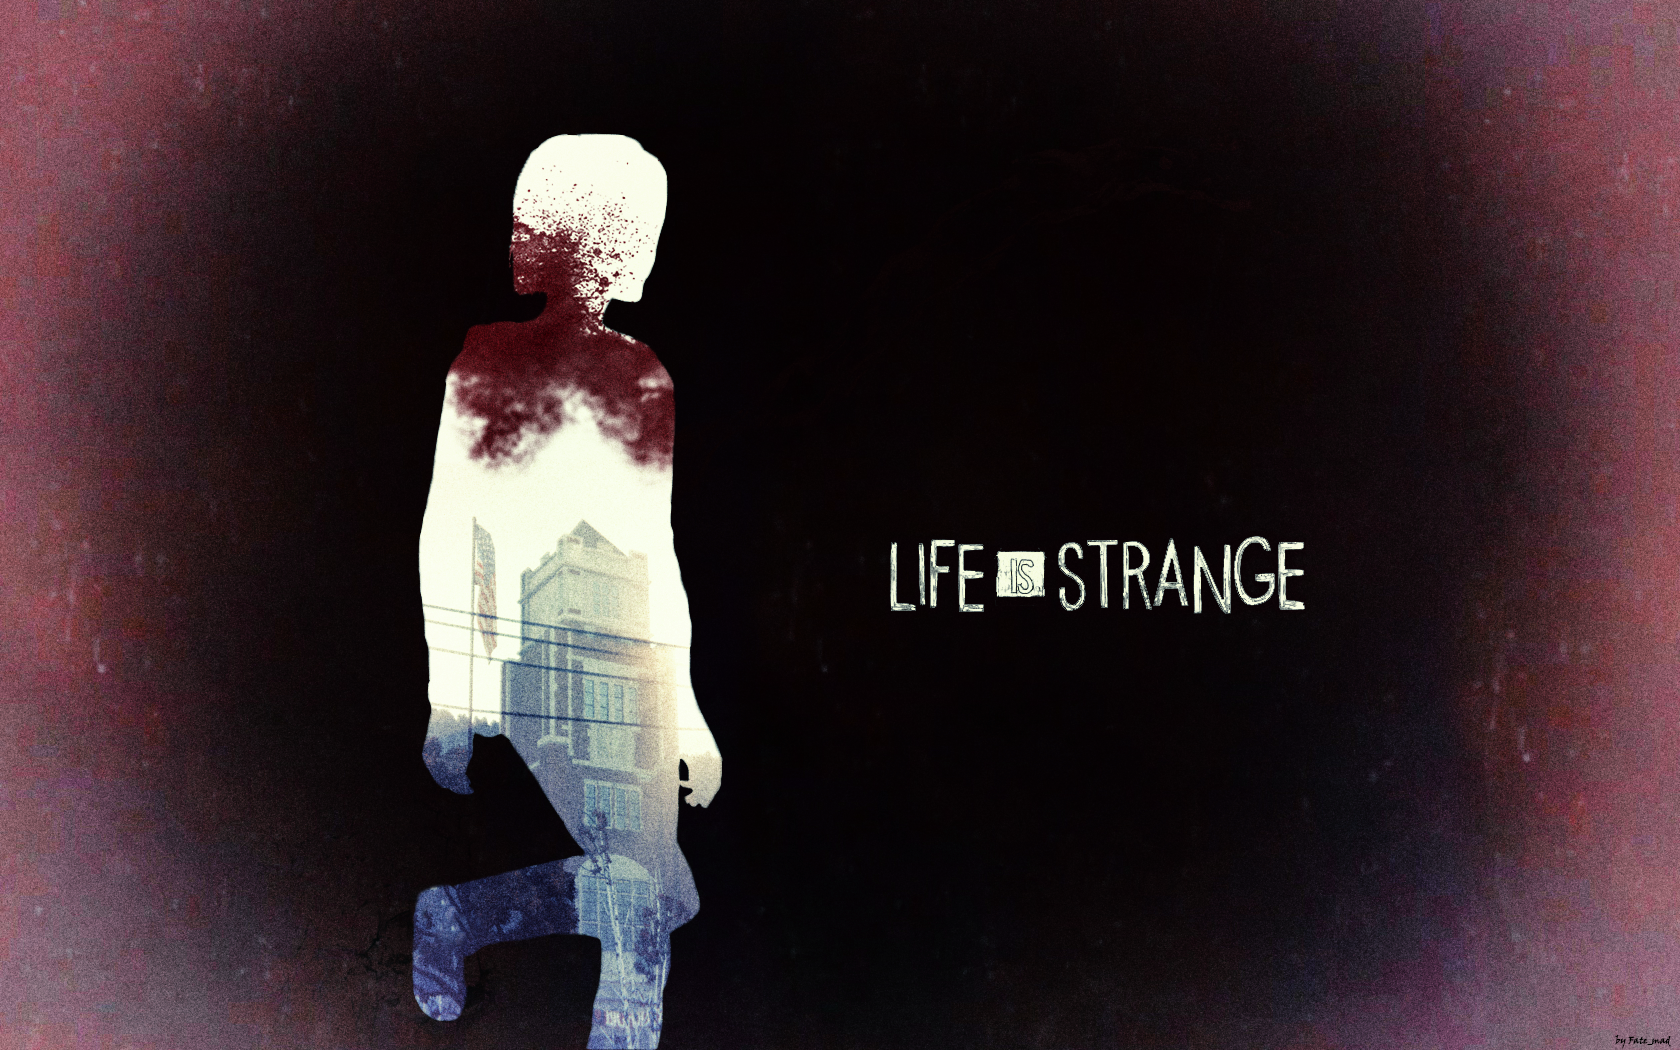 Life is strange. Maxine by NickKarlow on DeviantArt